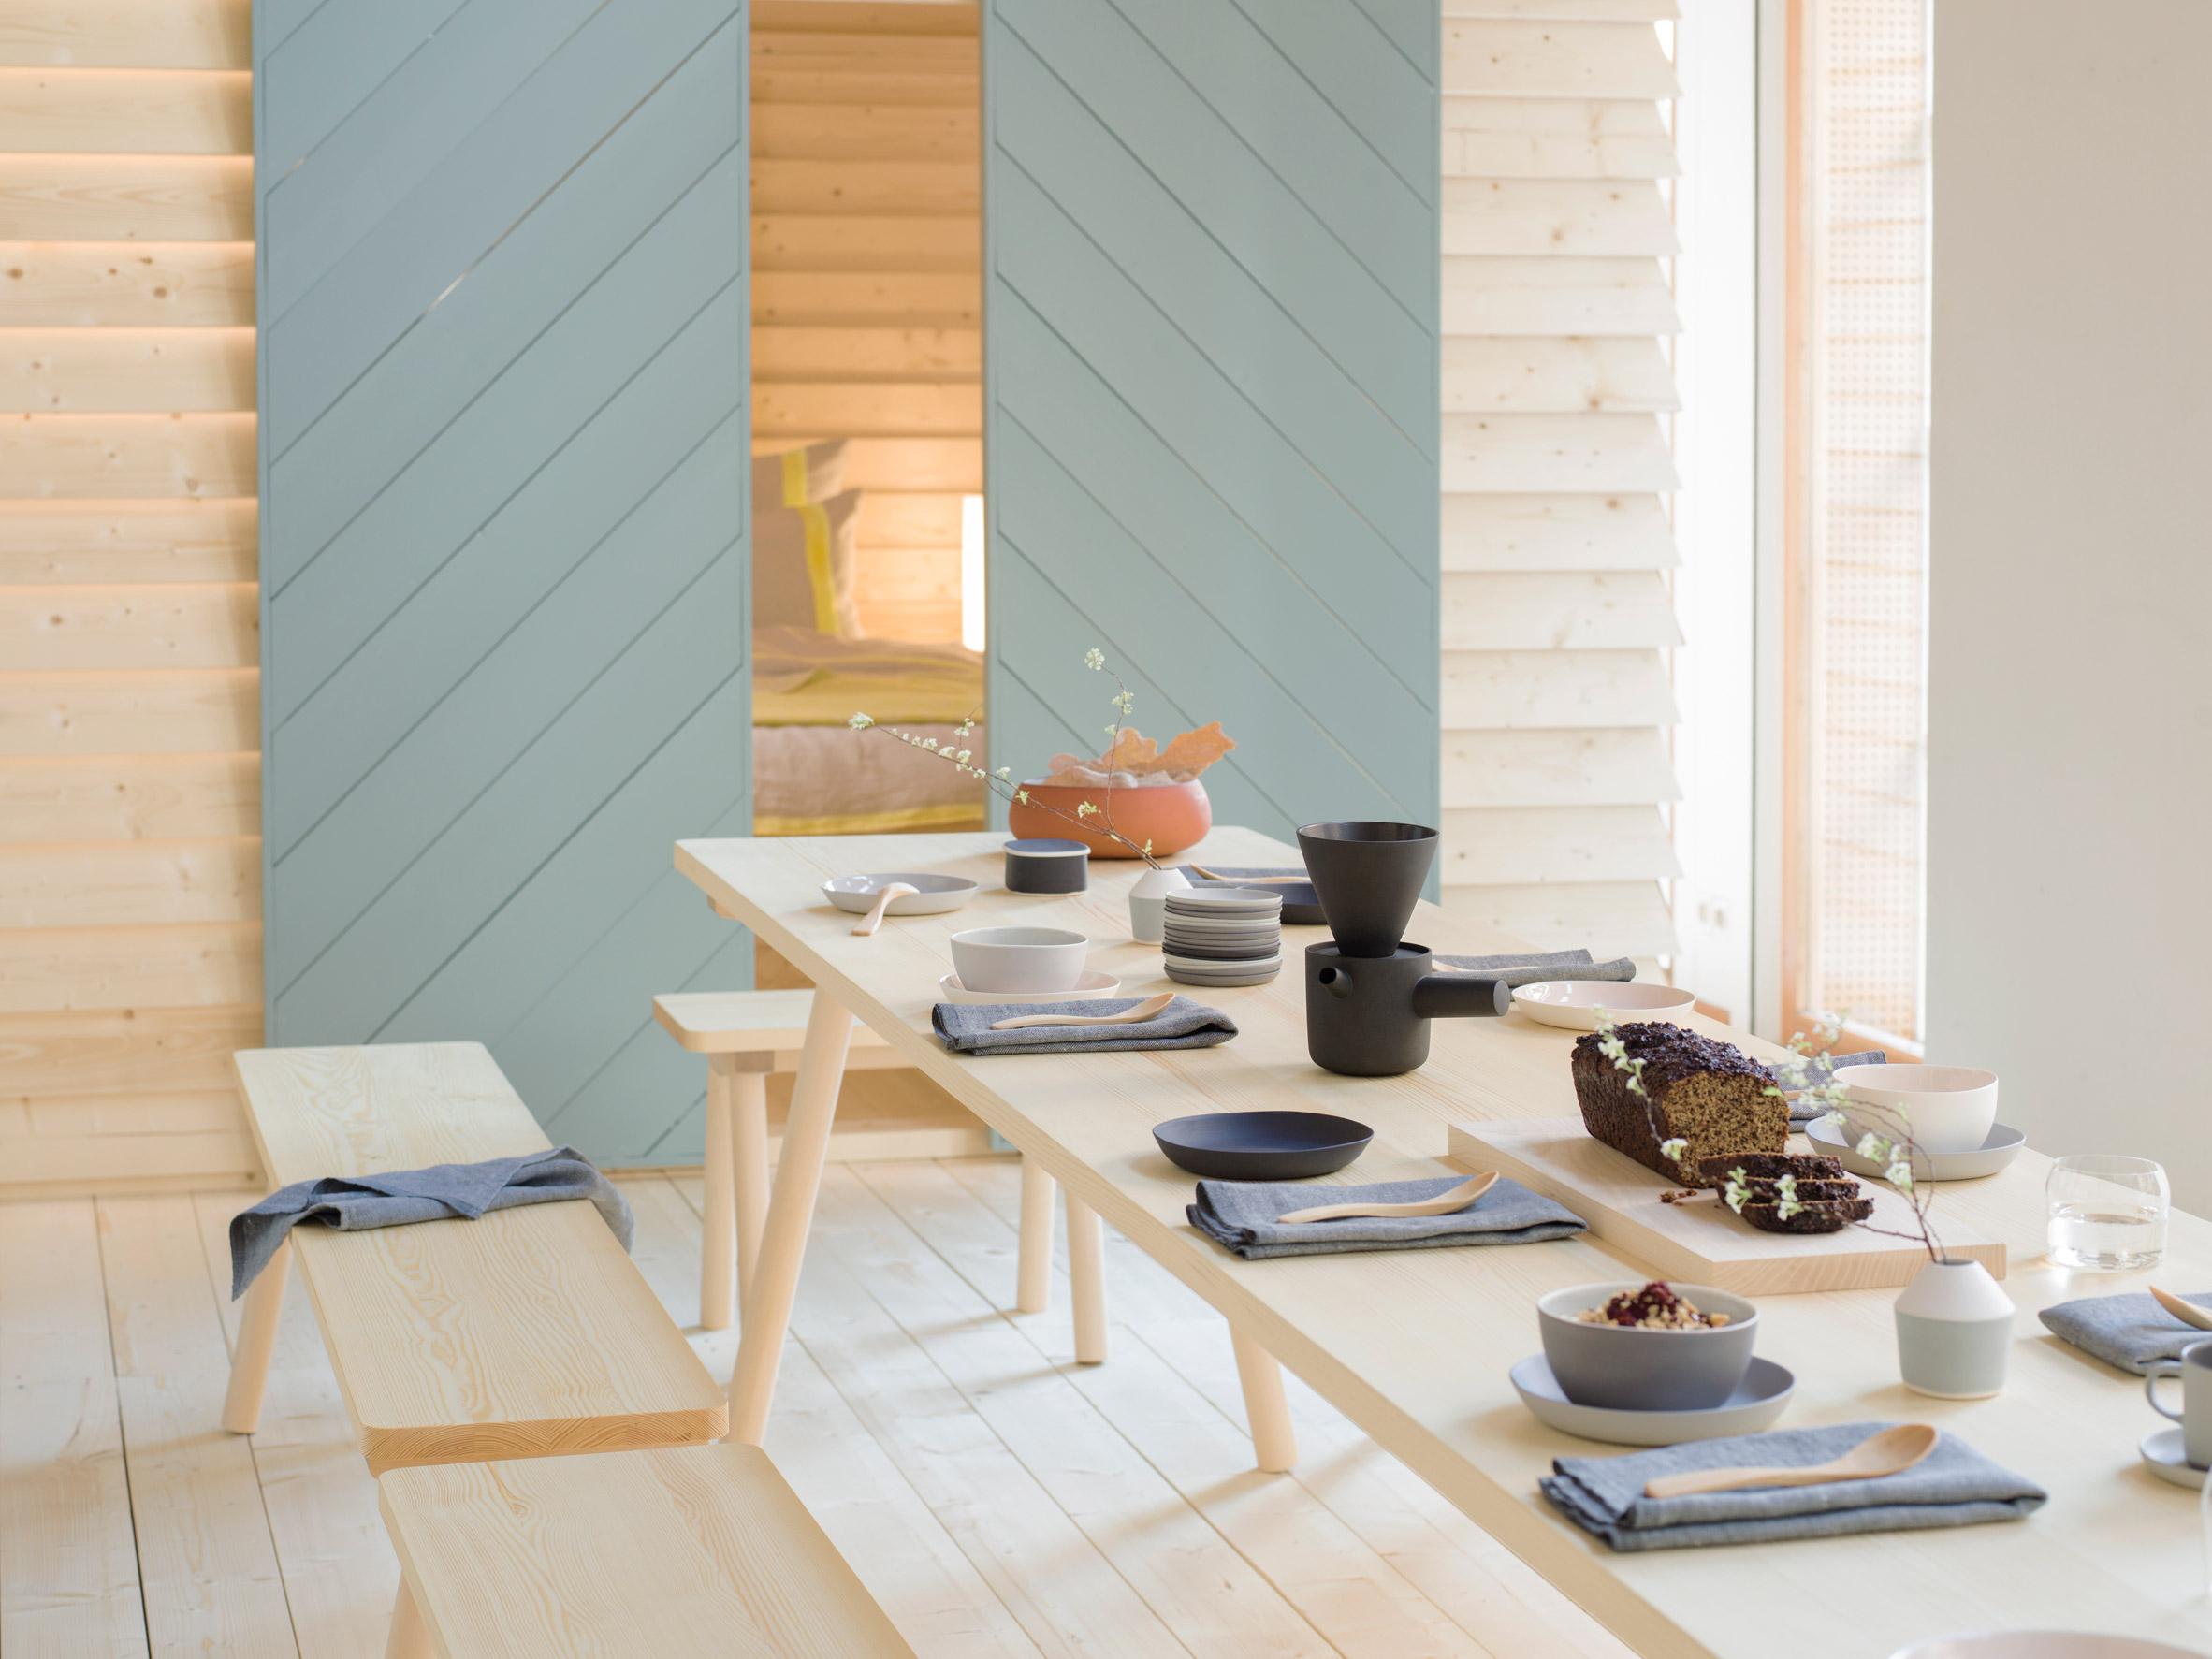 koti-popup-hotel-interiors-paris_dezeen_2364_col_9